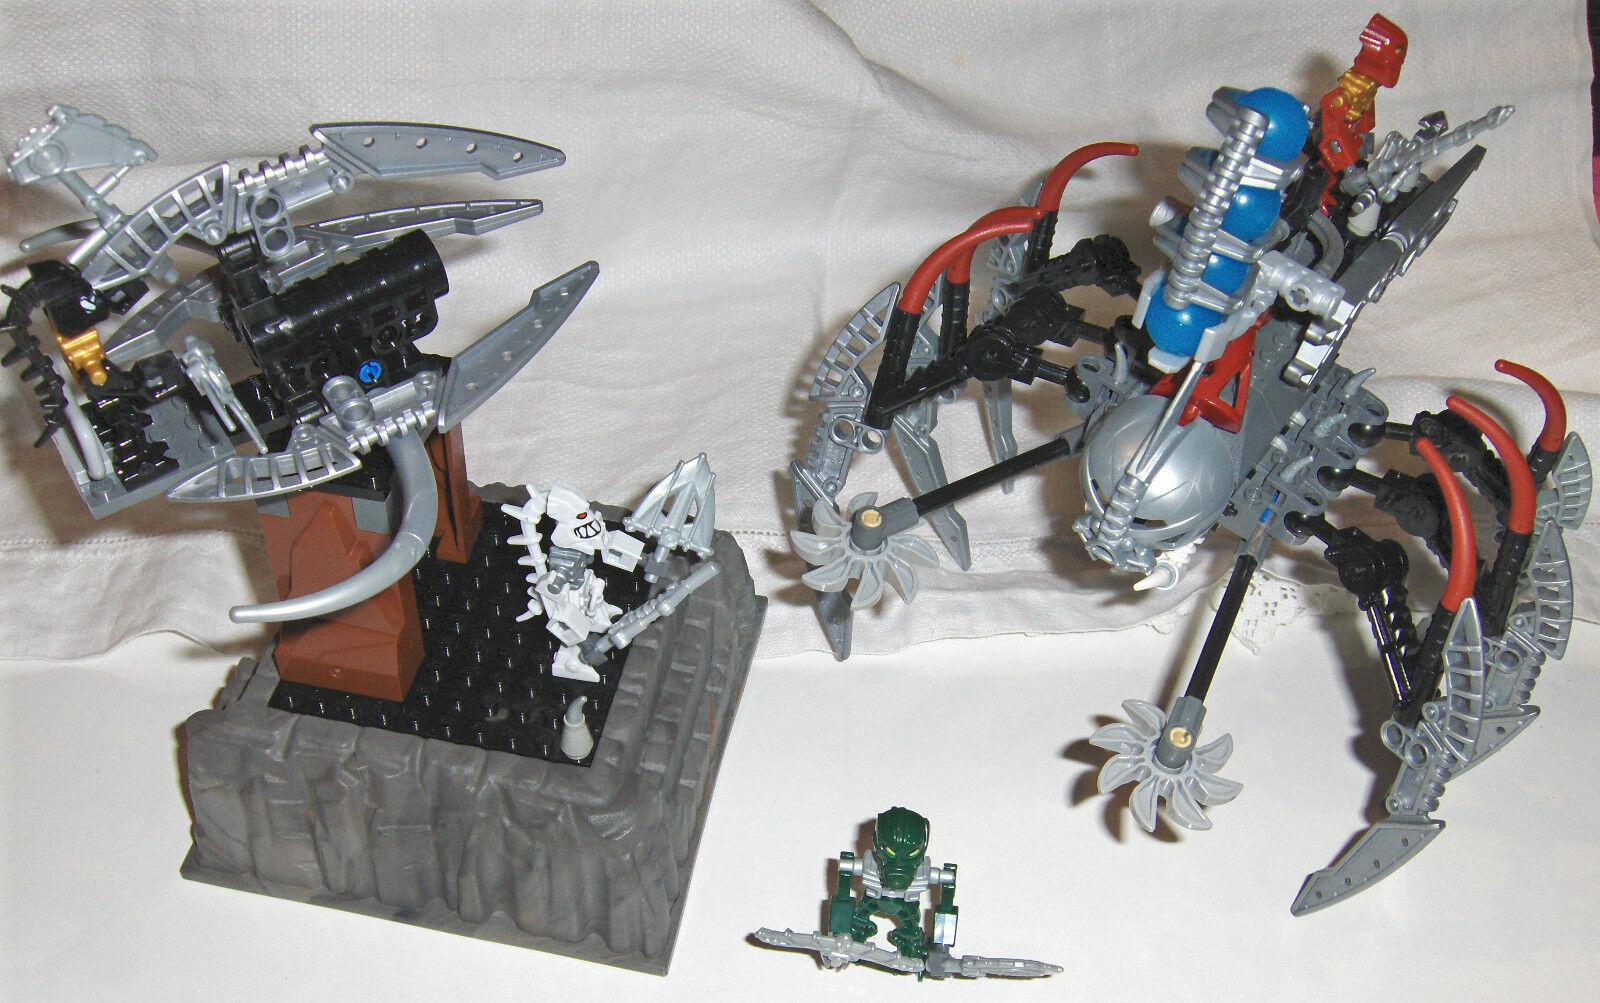 LEGO SET 8892 - BIONICLE PIRAKA PIRAKA PIRAKA OUTPOST, COMPLETE a4cd79